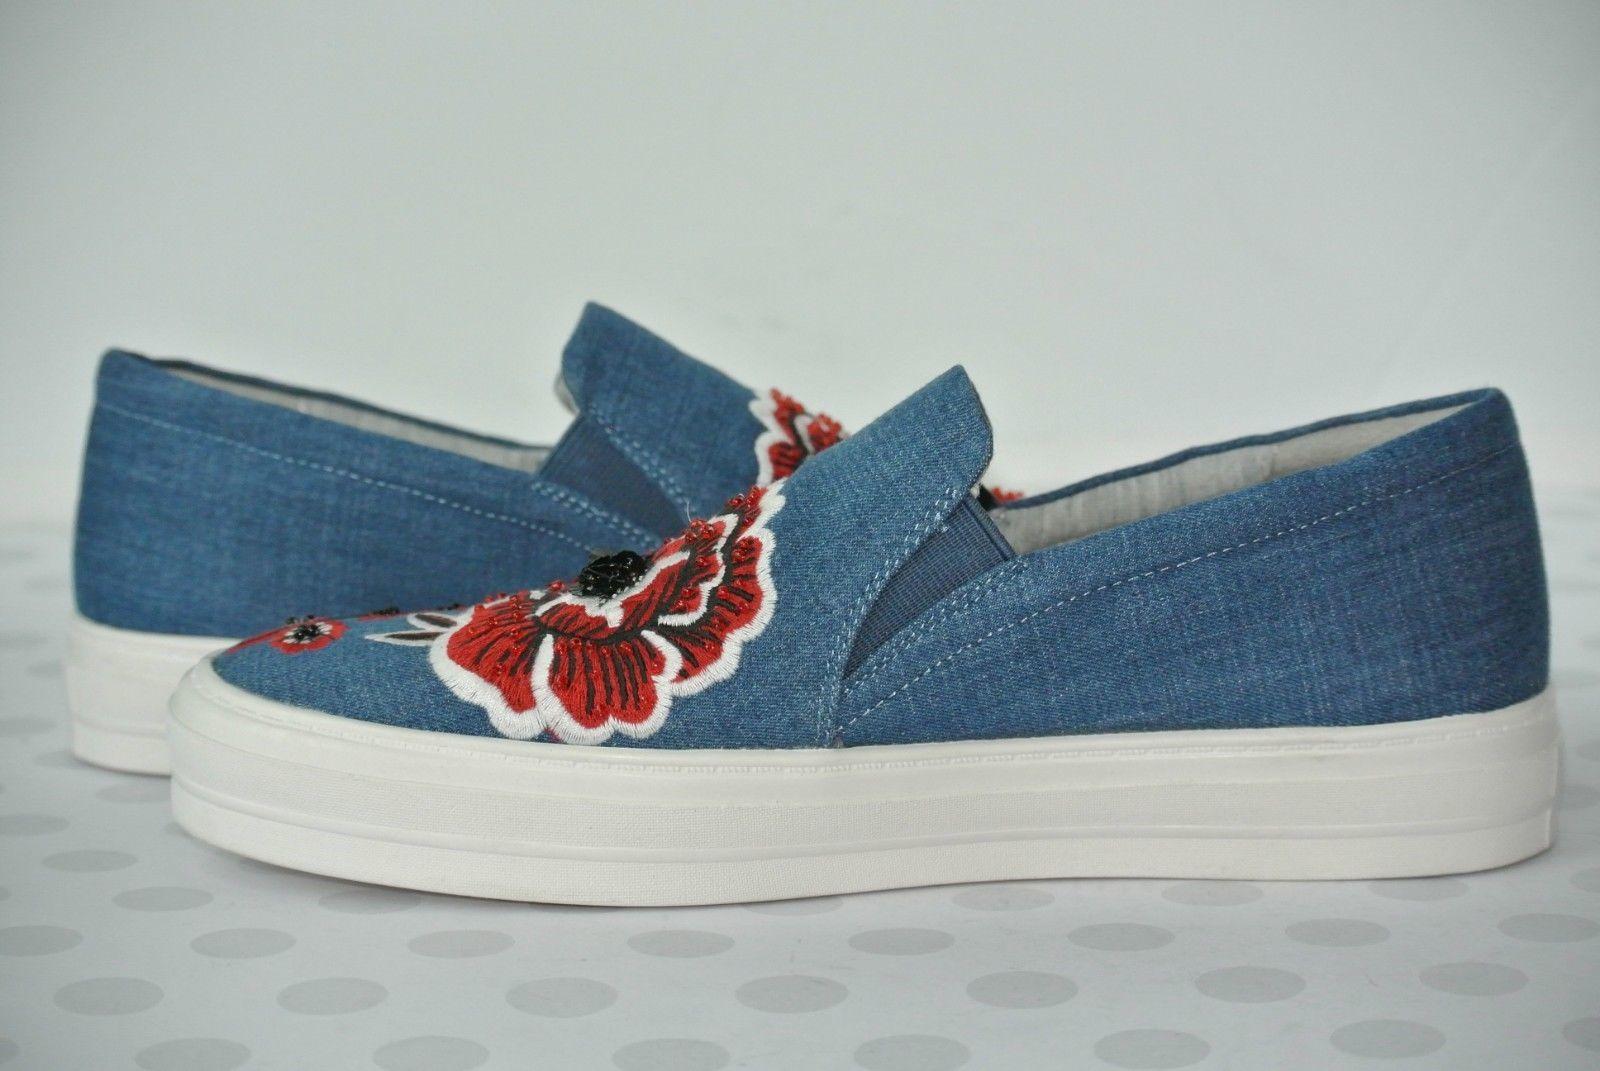 NEW Nine West Onyeka Womens Sz 7.5 M Blue Denim Slip On Platform Sneakers